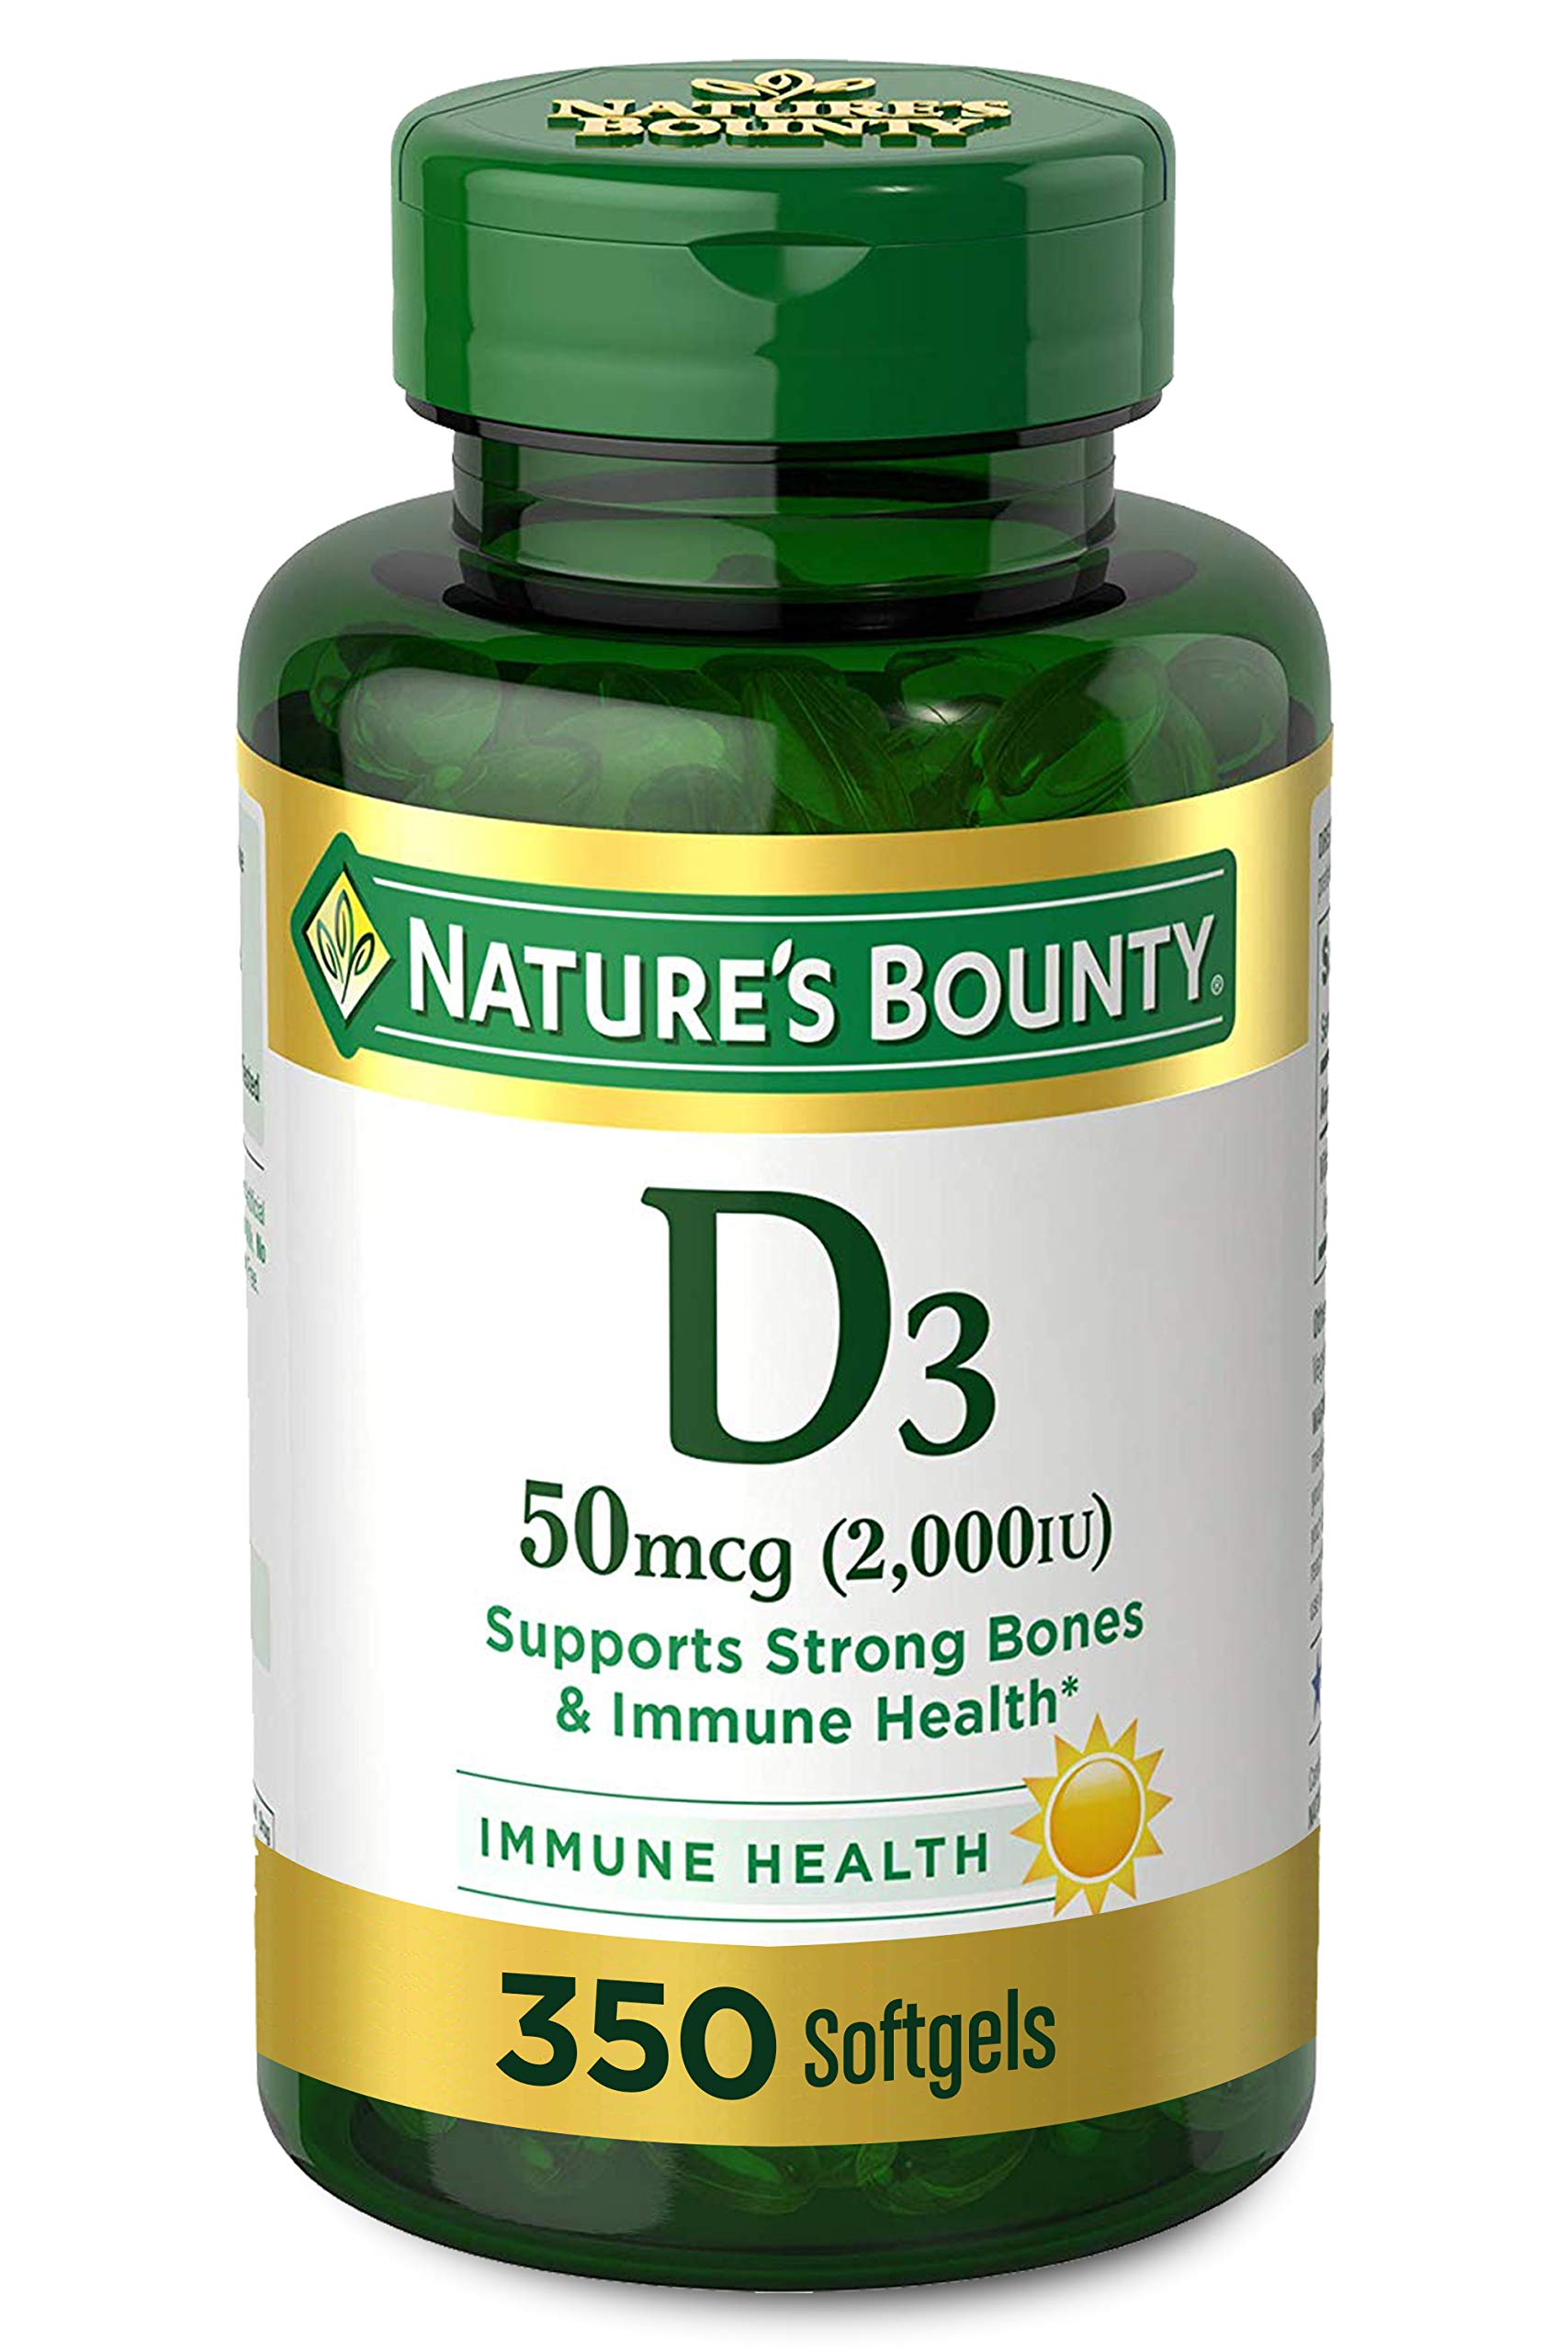 Vitamin D3 by Nature's Bounty for Immune Support. Vitamin D Provides Immune Support and Promotes Healthy Bones. 2000IU, 350 Softgels